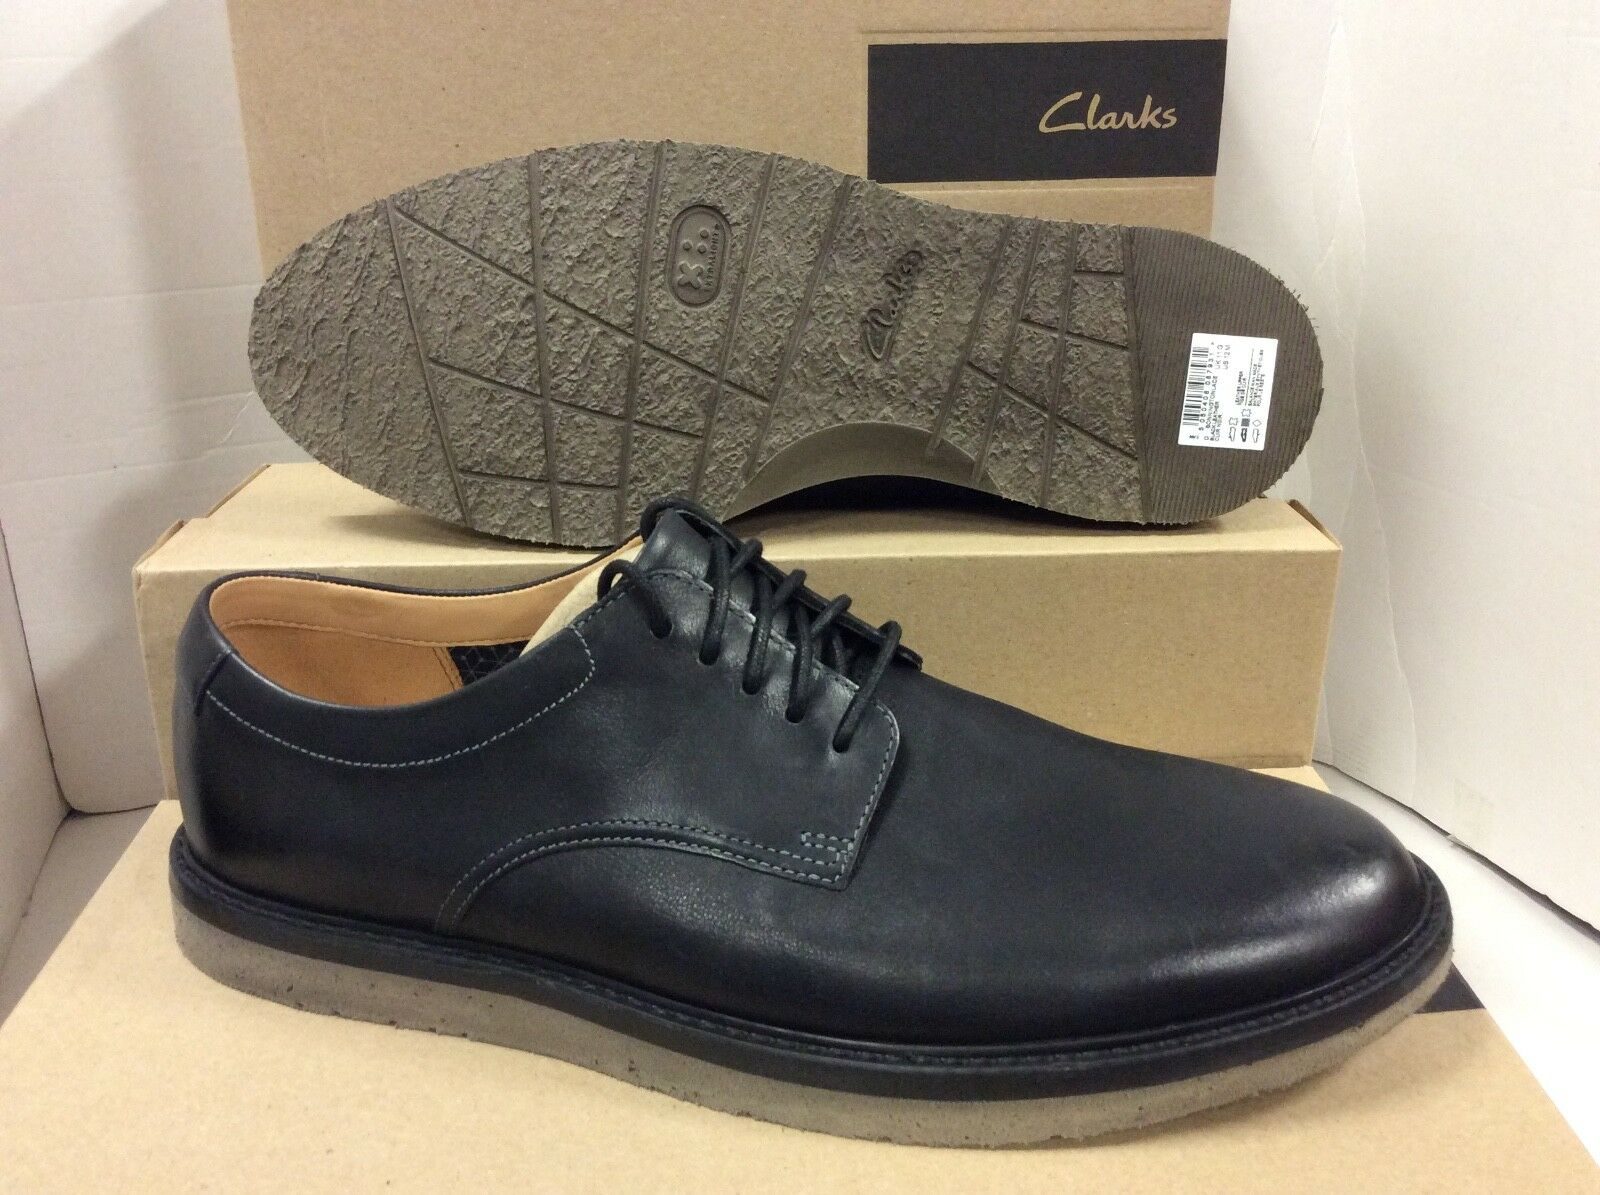 Clarks in Bonningtonlace Scarpe da uomo in Clarks pelle nera, taglia /EUR 46 92c7bb